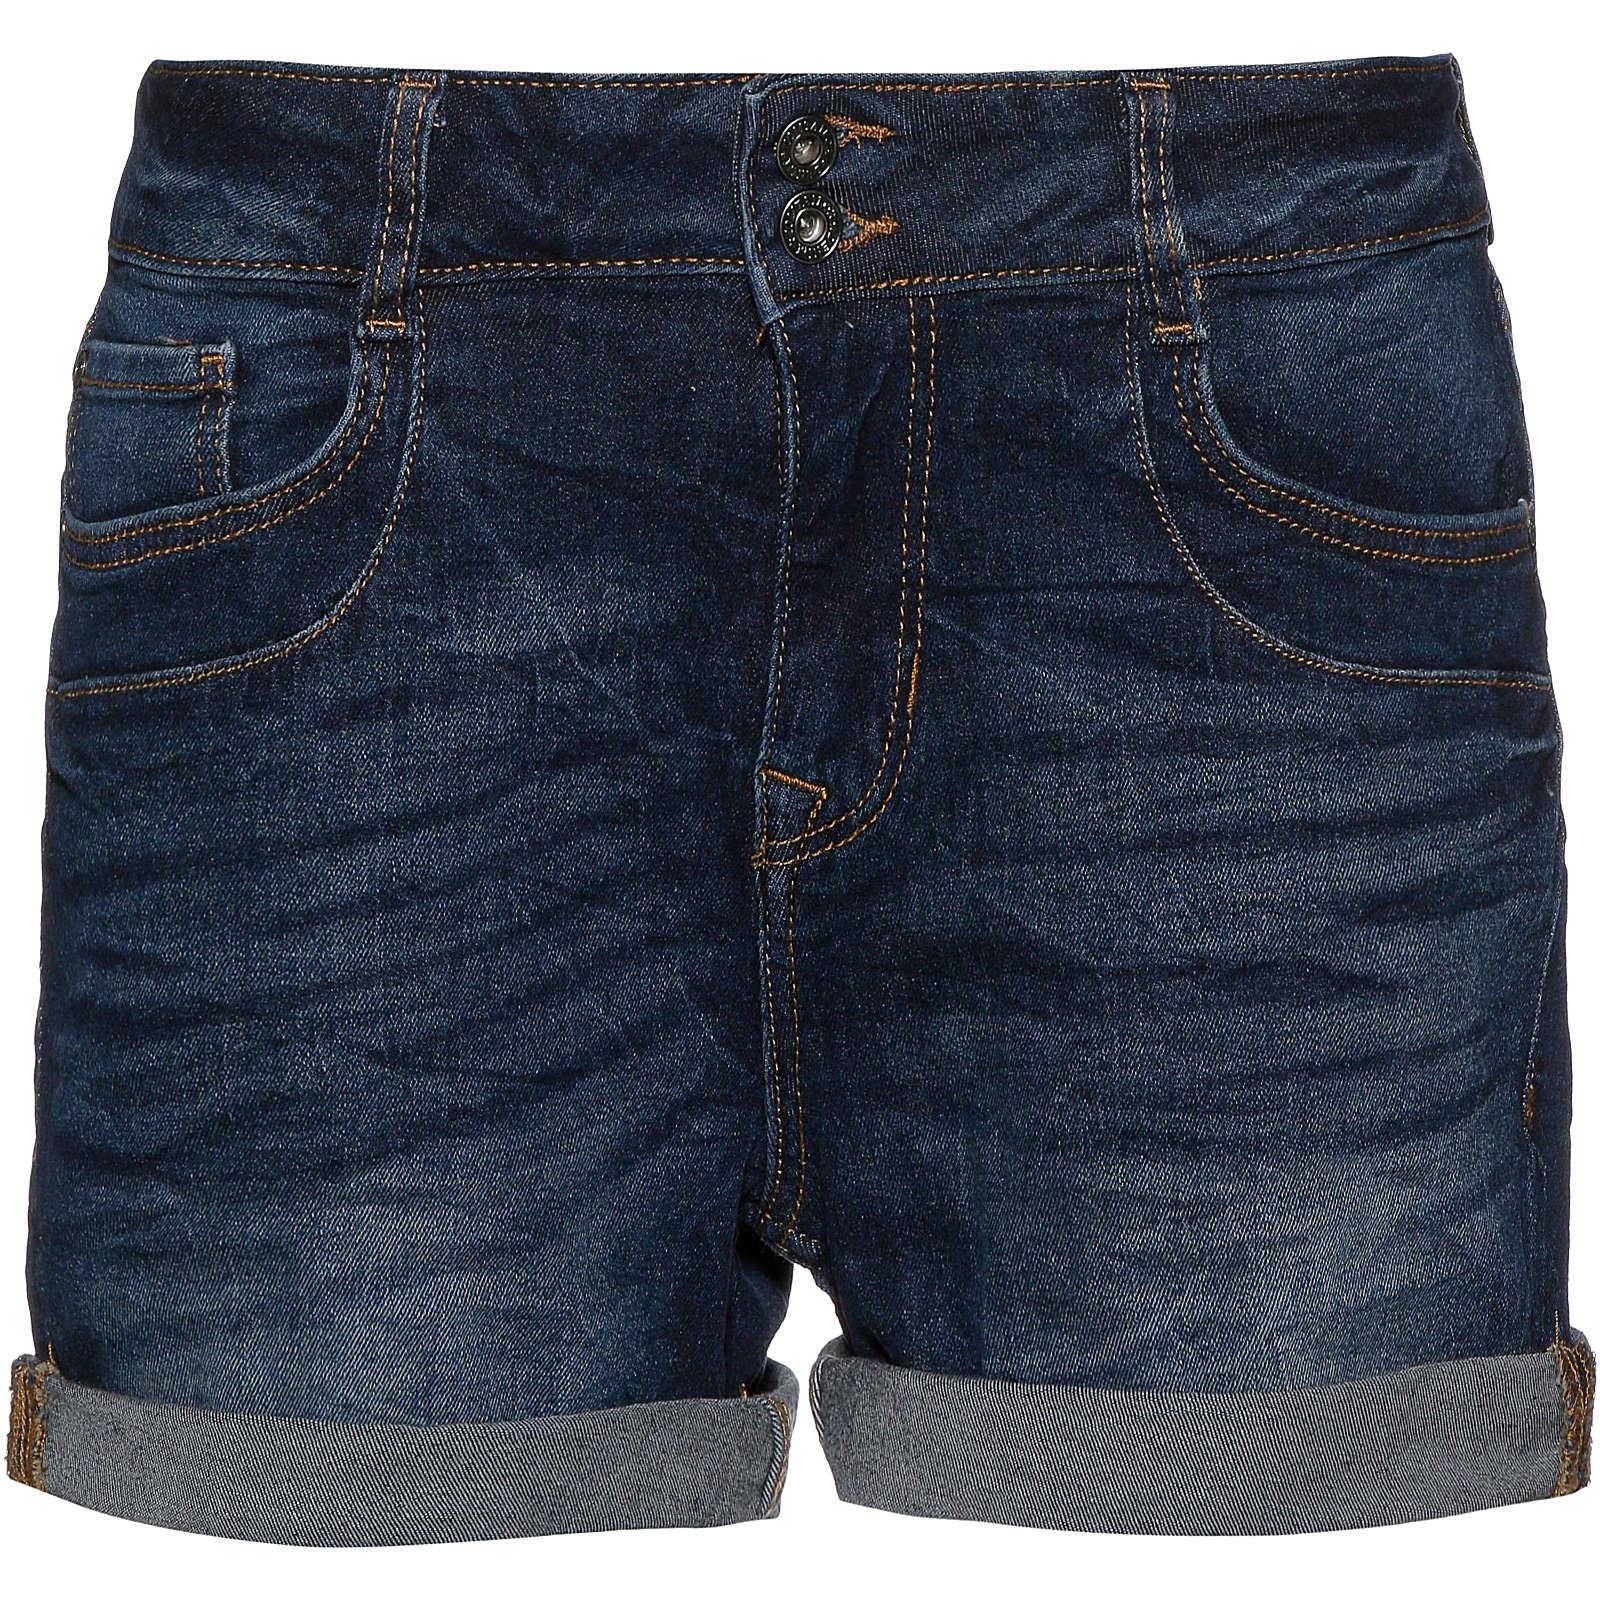 Tom Tailor Denim Jeansshorts Cajsa Jeansshorts blau Damen Gr. 34